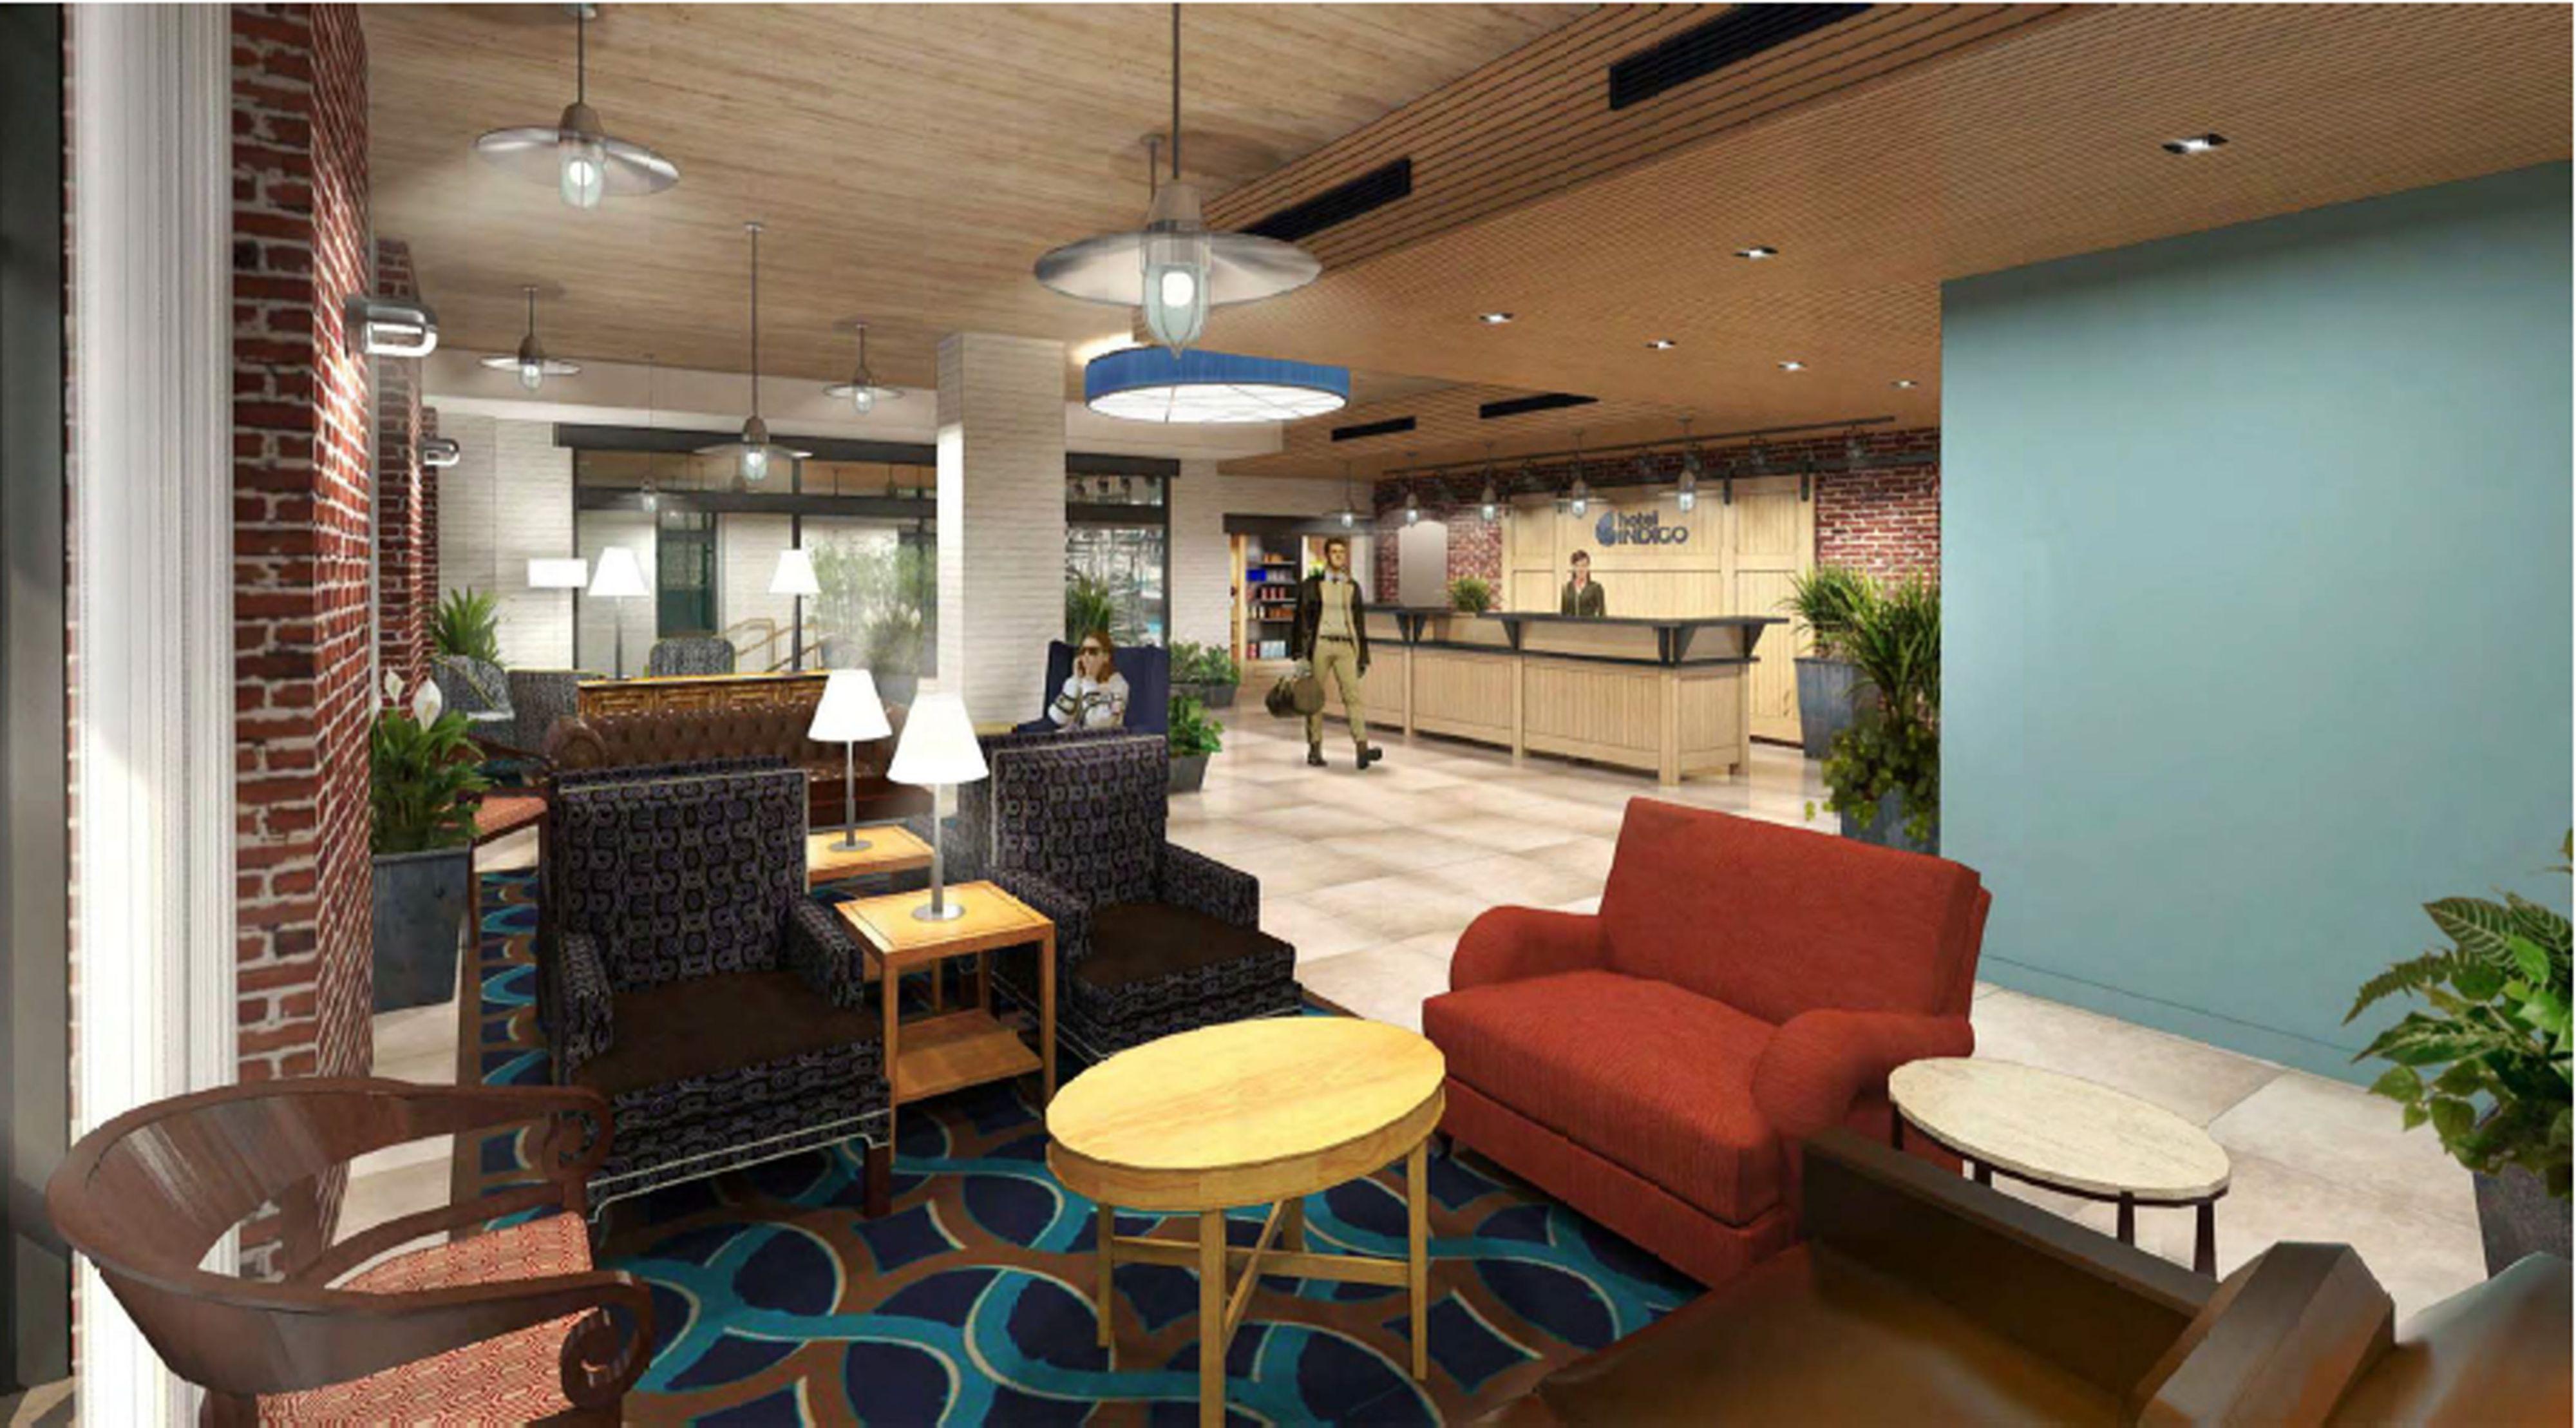 Hotel Indigo Old Town Alexandria in Alexandria, VA - (703) 721-3...